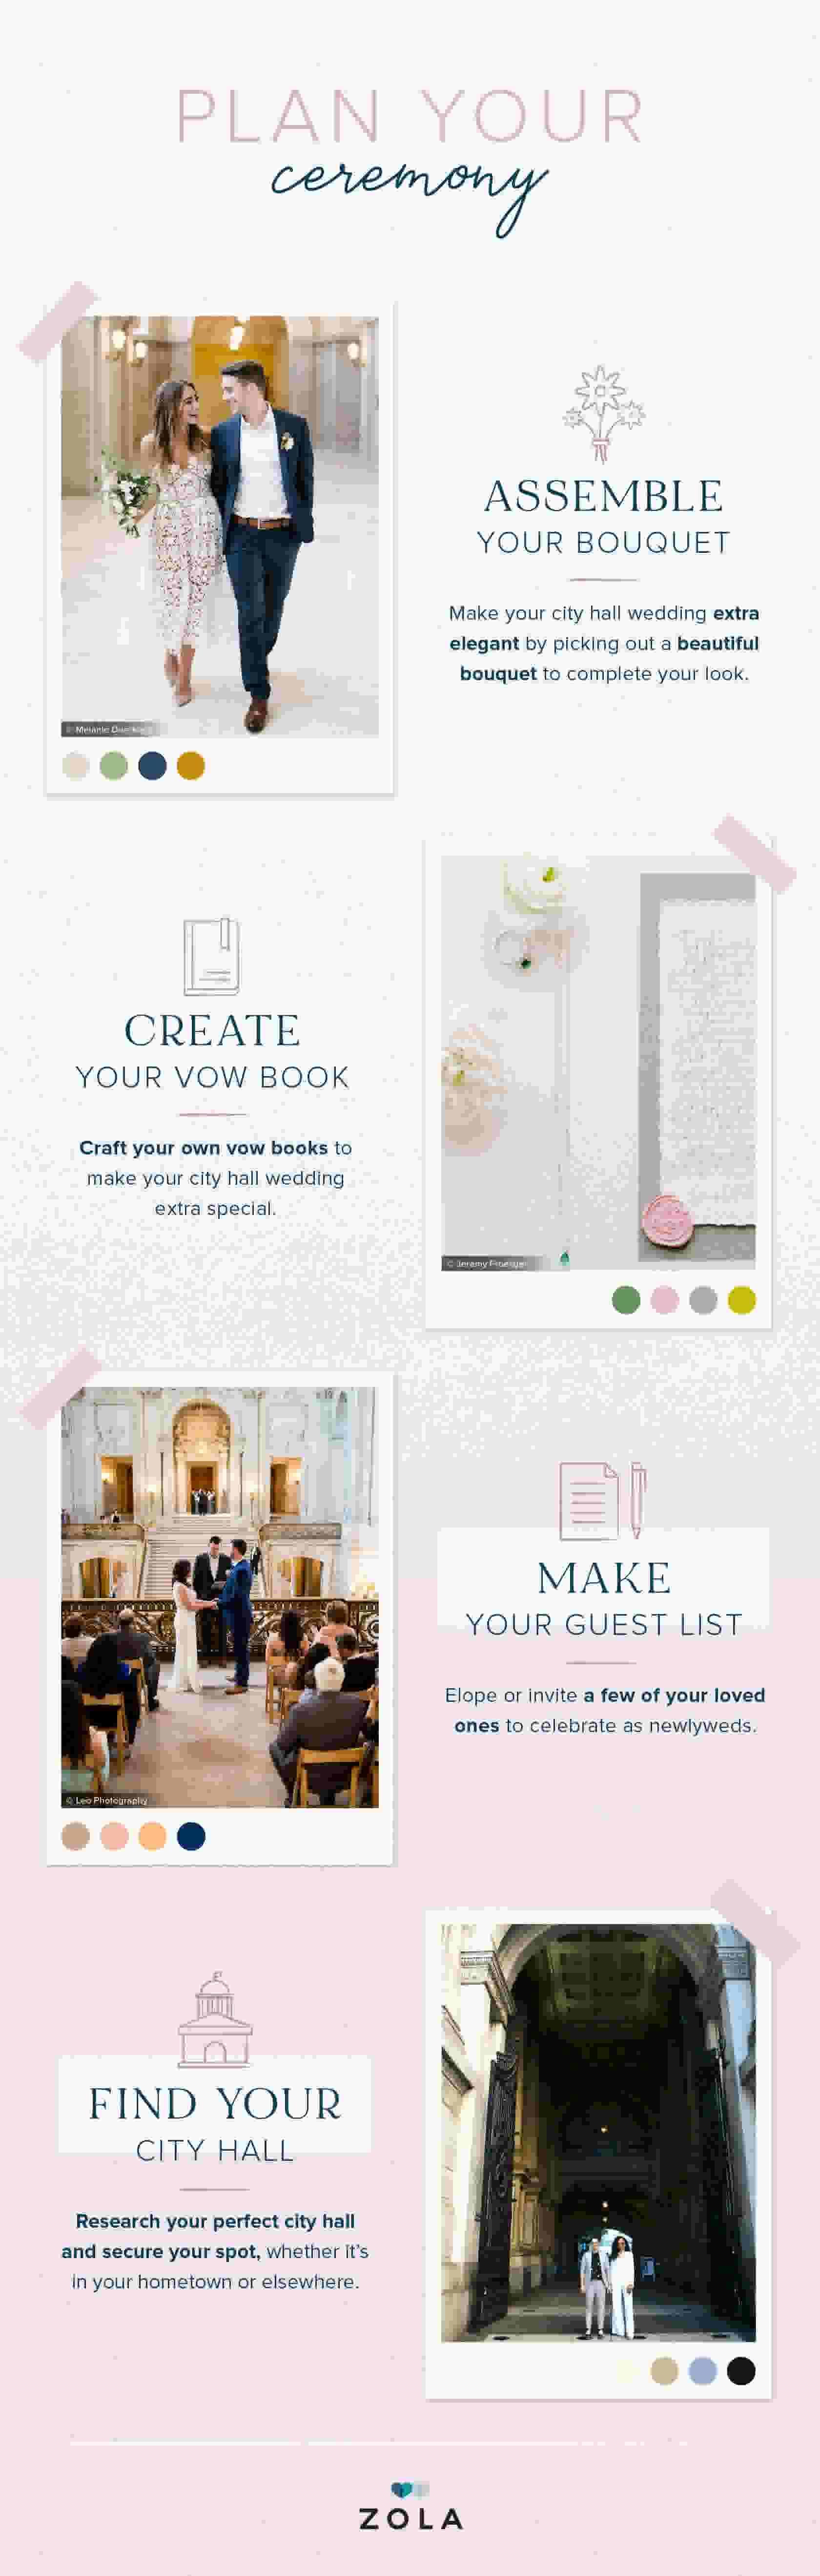 Plan your ceremony